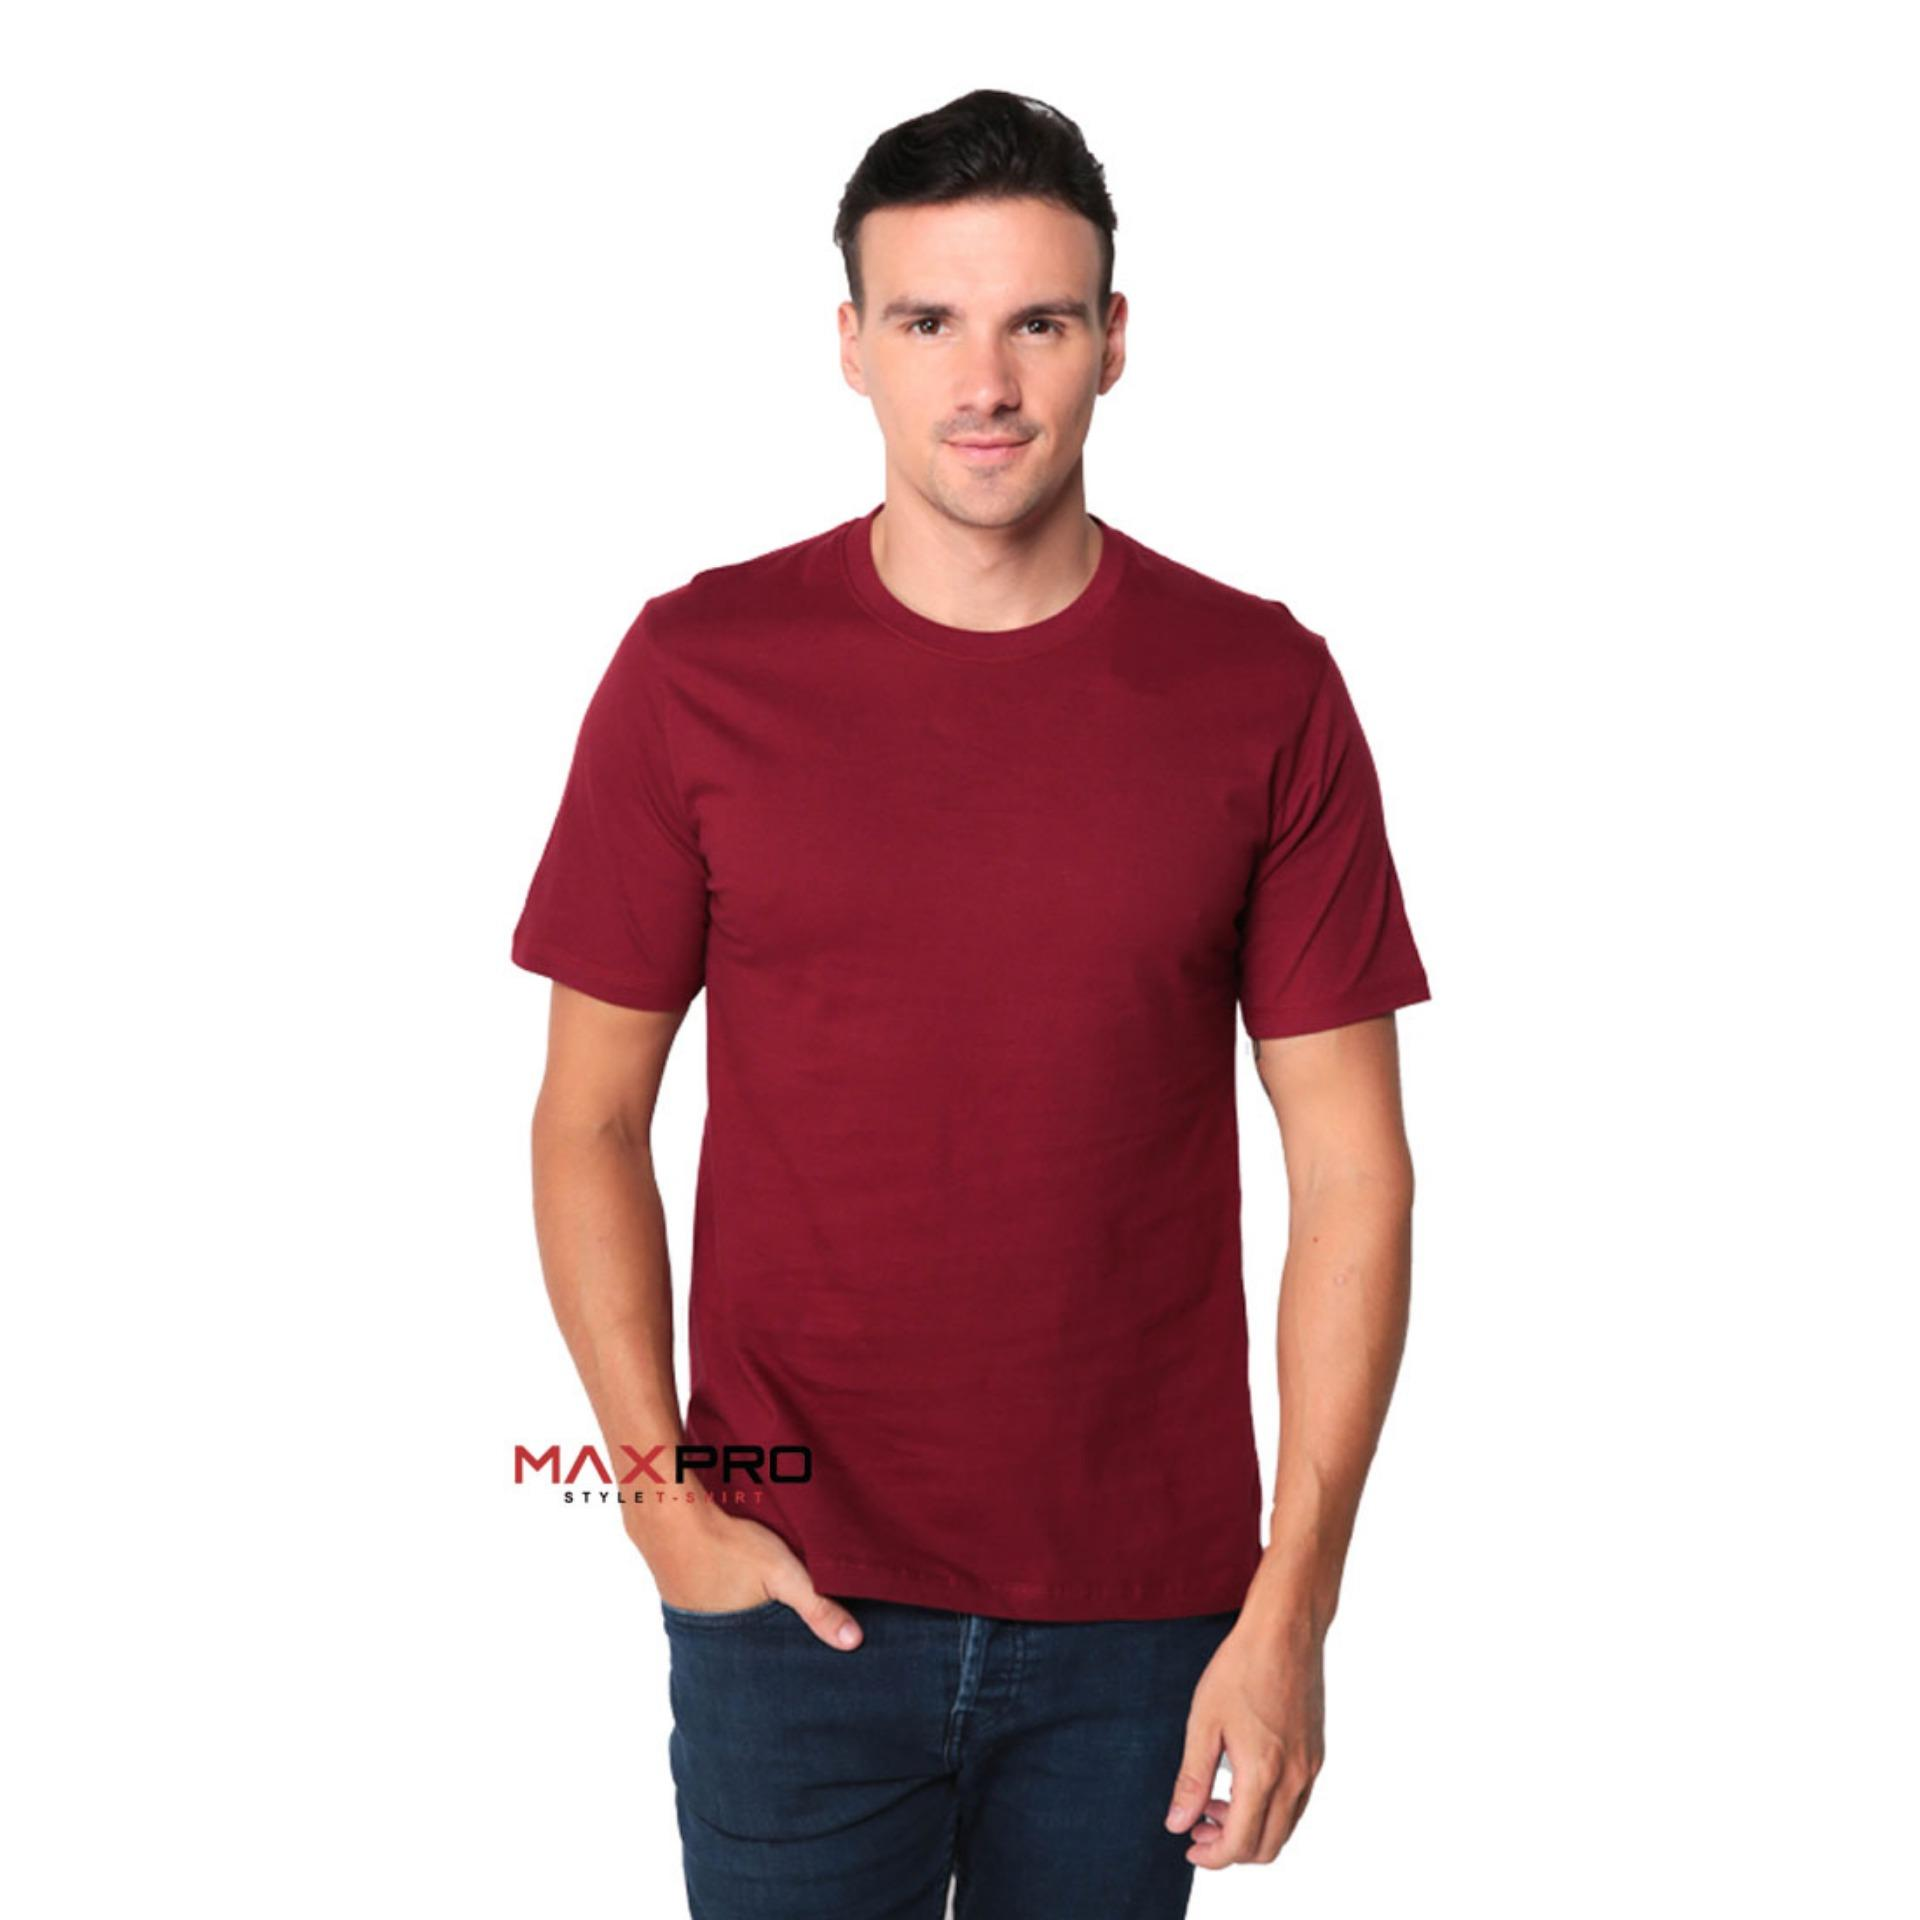 MaXPro Kaos Polos Pria Merah Maroon  - T-Shirt Distro Cowok Tumblr Tee / Kaos Oblong / Kaos Distro / Kaos Couple / Baju Kaos Atasan Pria Marun